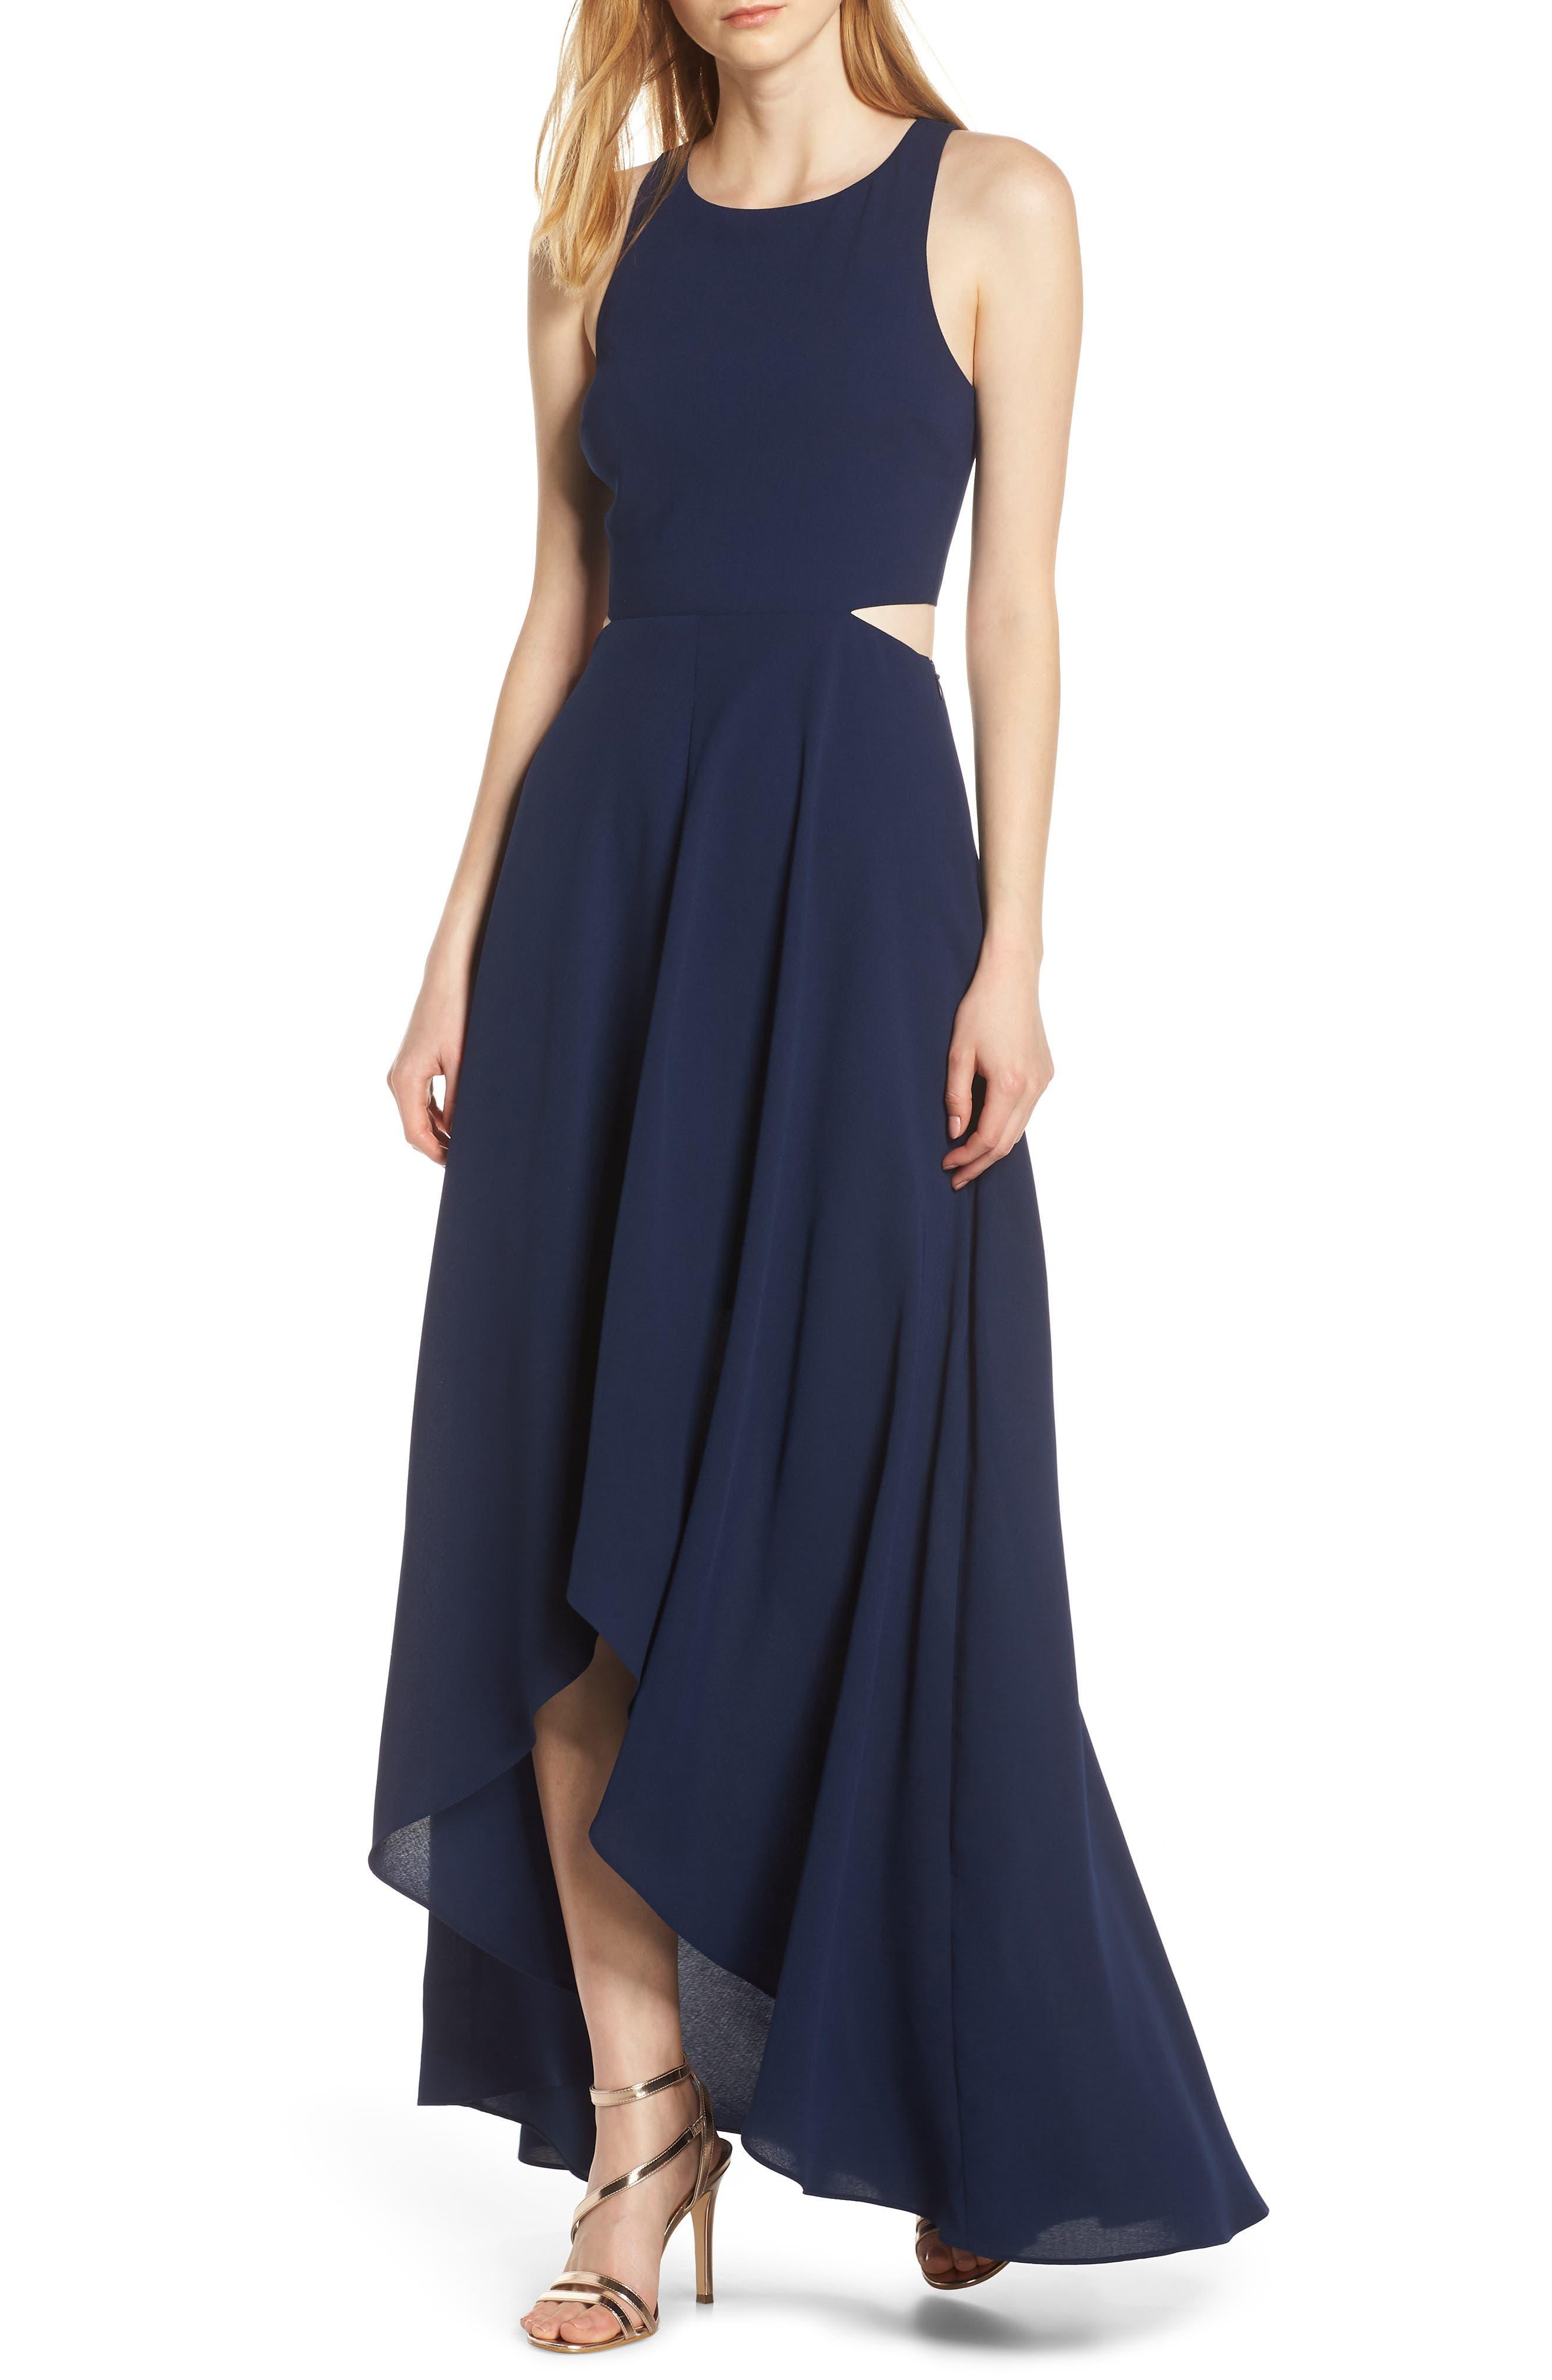 websites for sorority formal dresses